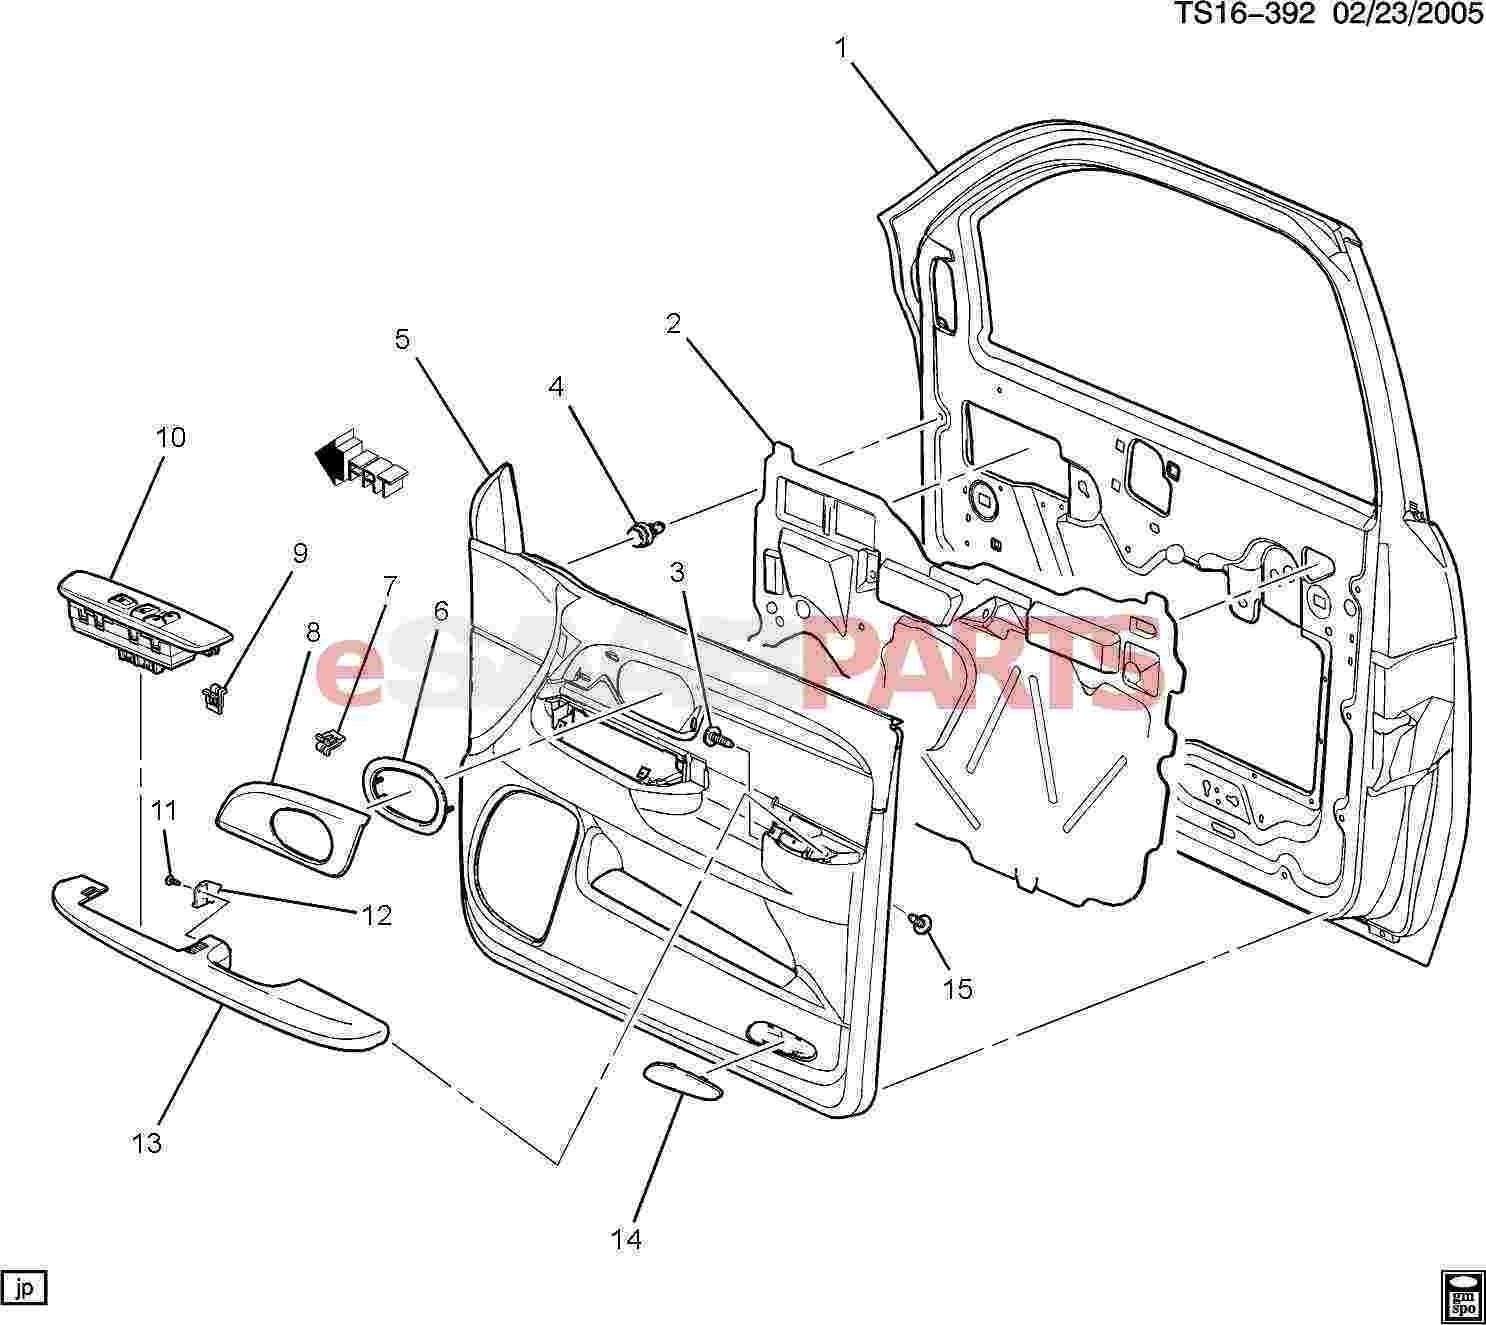 Car Door Parts Names Diagram 44 Awesome Car Door Trim Parts Of Car Door Parts Names Diagram